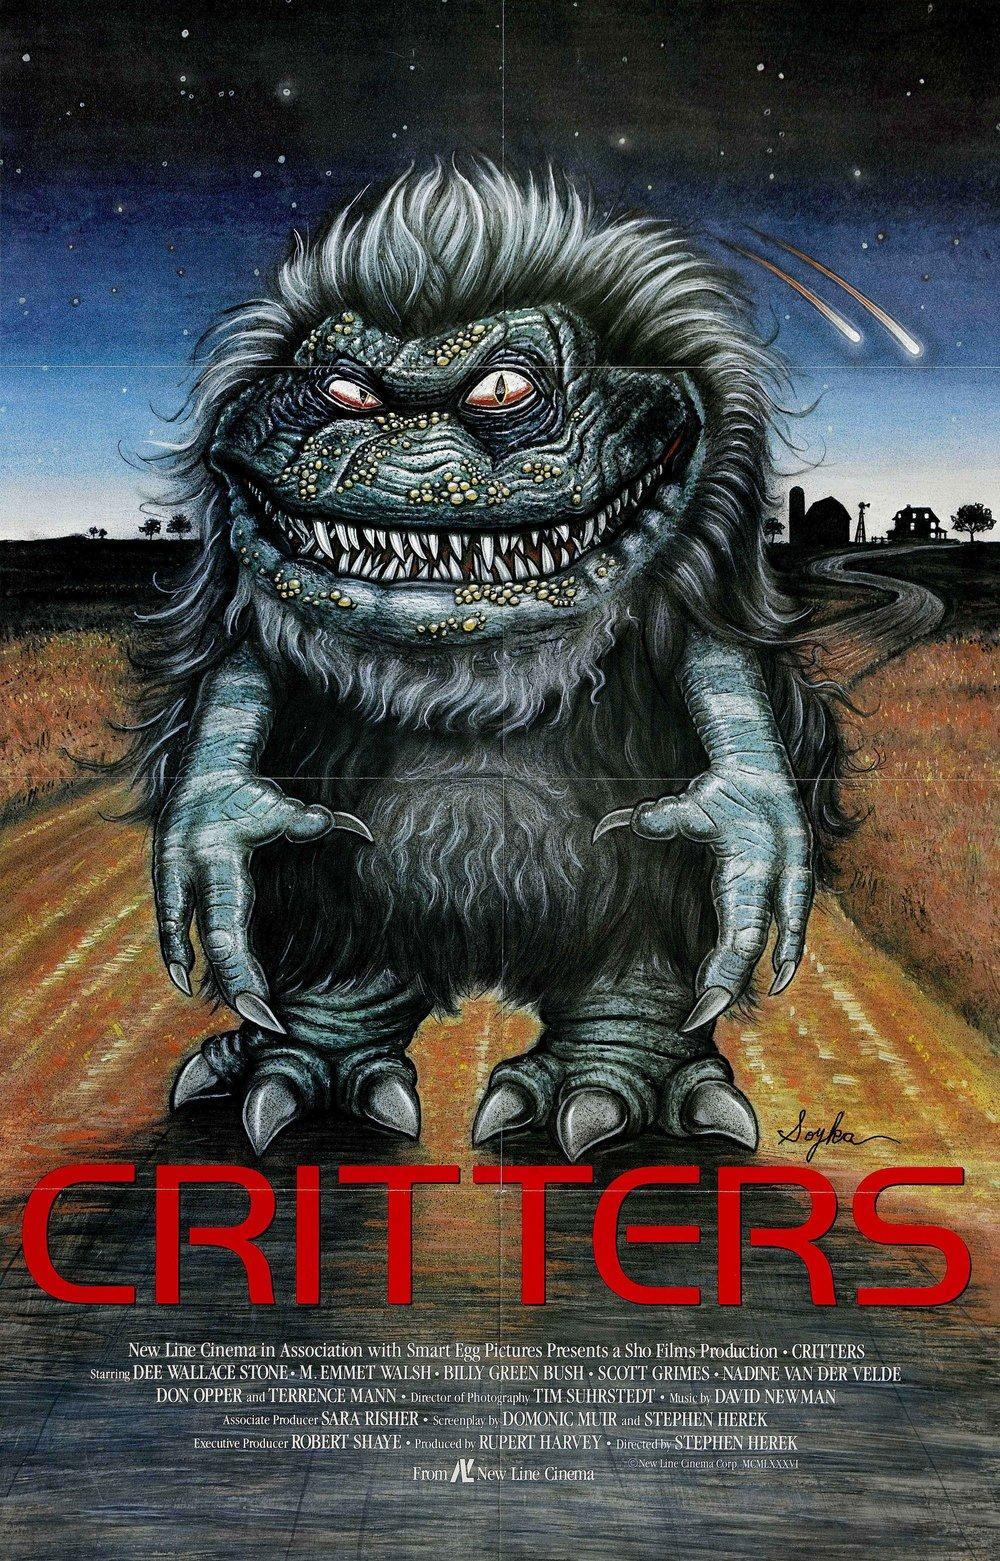 trailer de critters